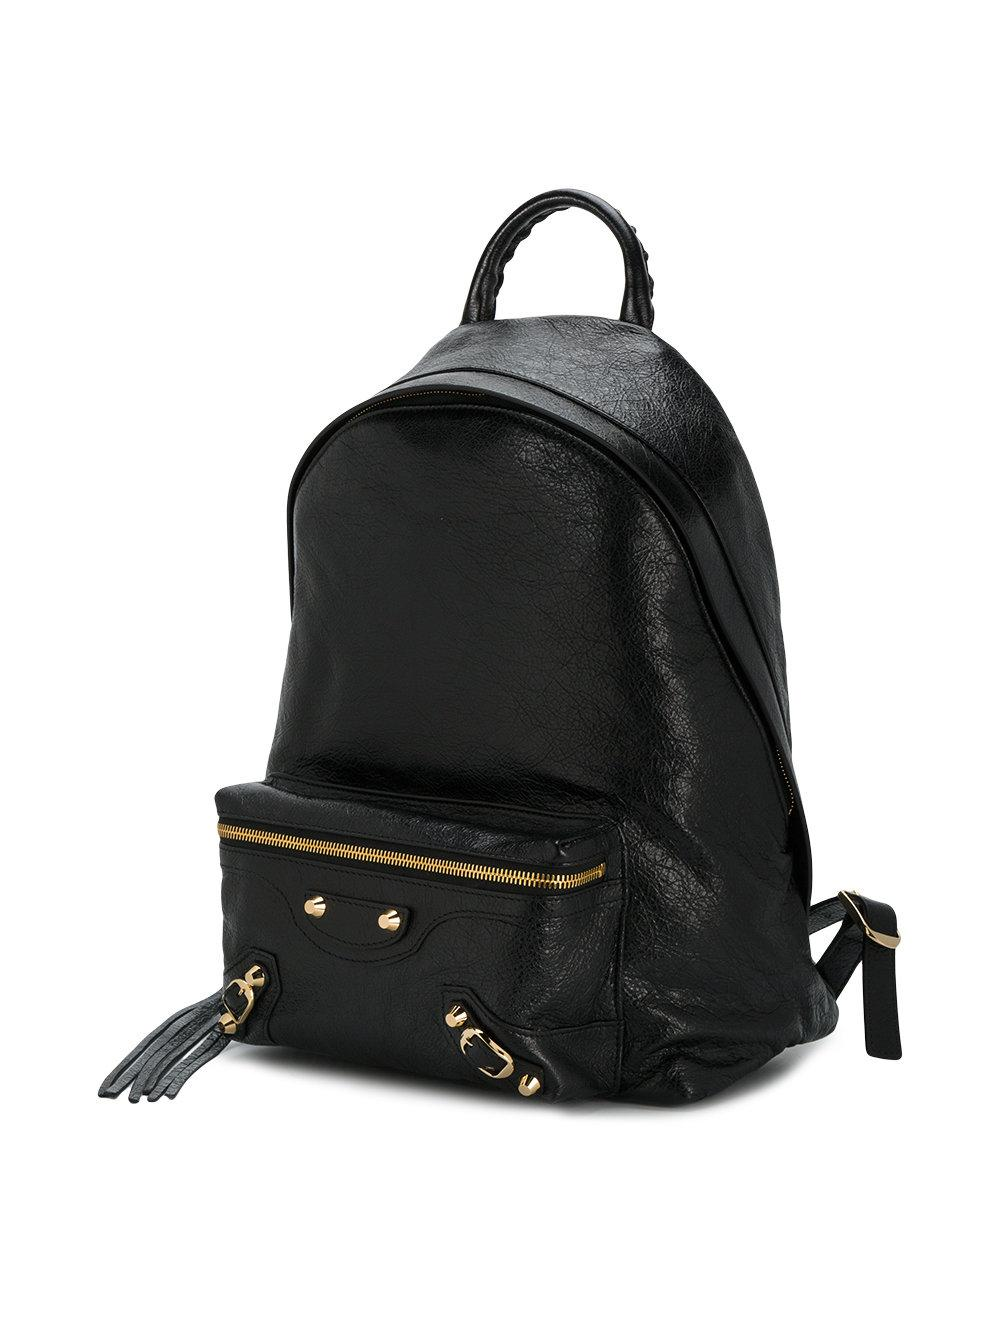 54996d08cfc Lyst - Balenciaga Classic City Backpack in Black